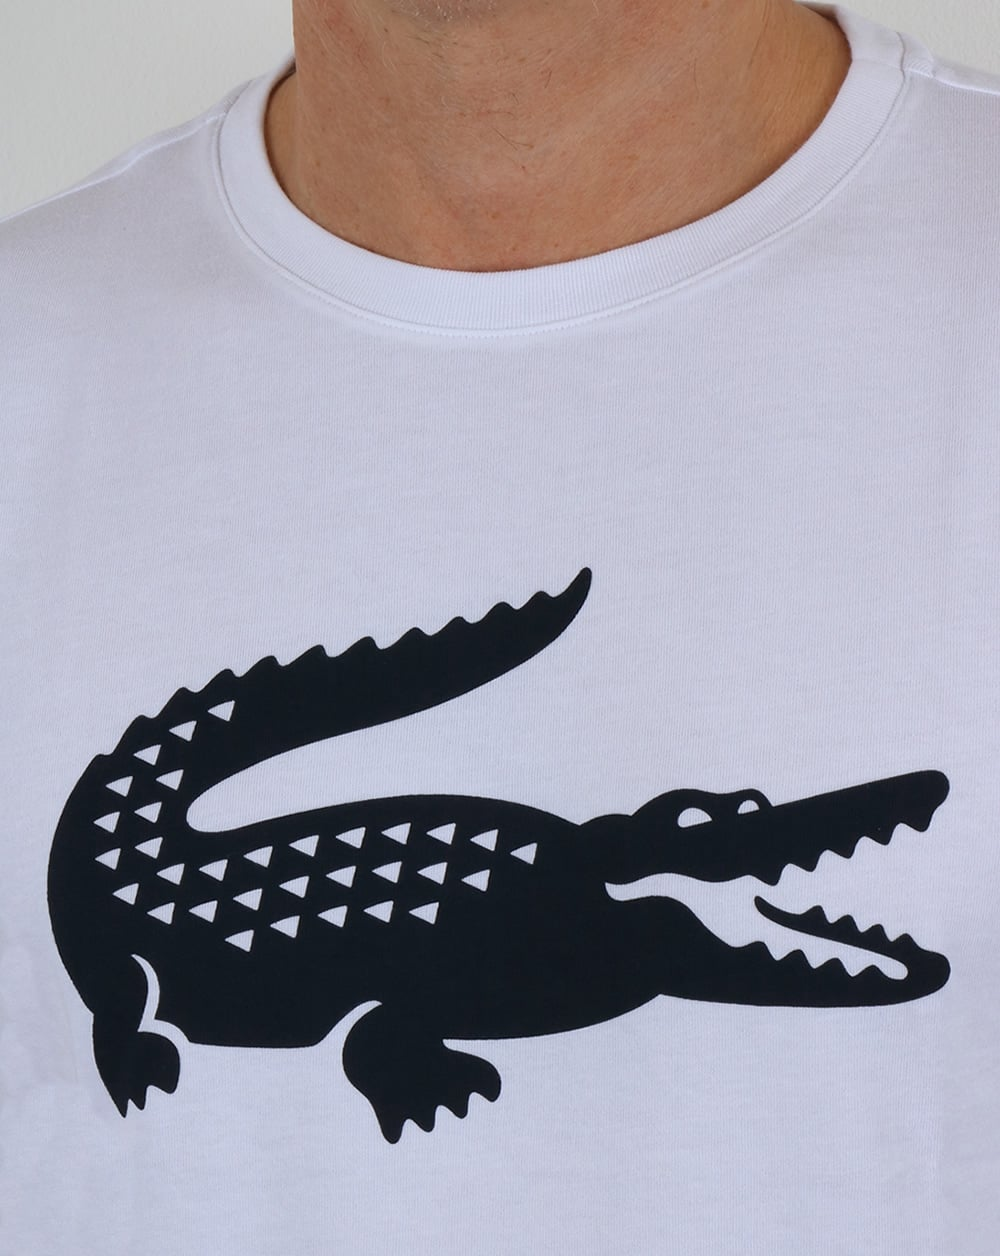 62b400f175fb Lacoste Croc Print T Shirt White/Navy,tee,crew,round,neck,graphic,mens